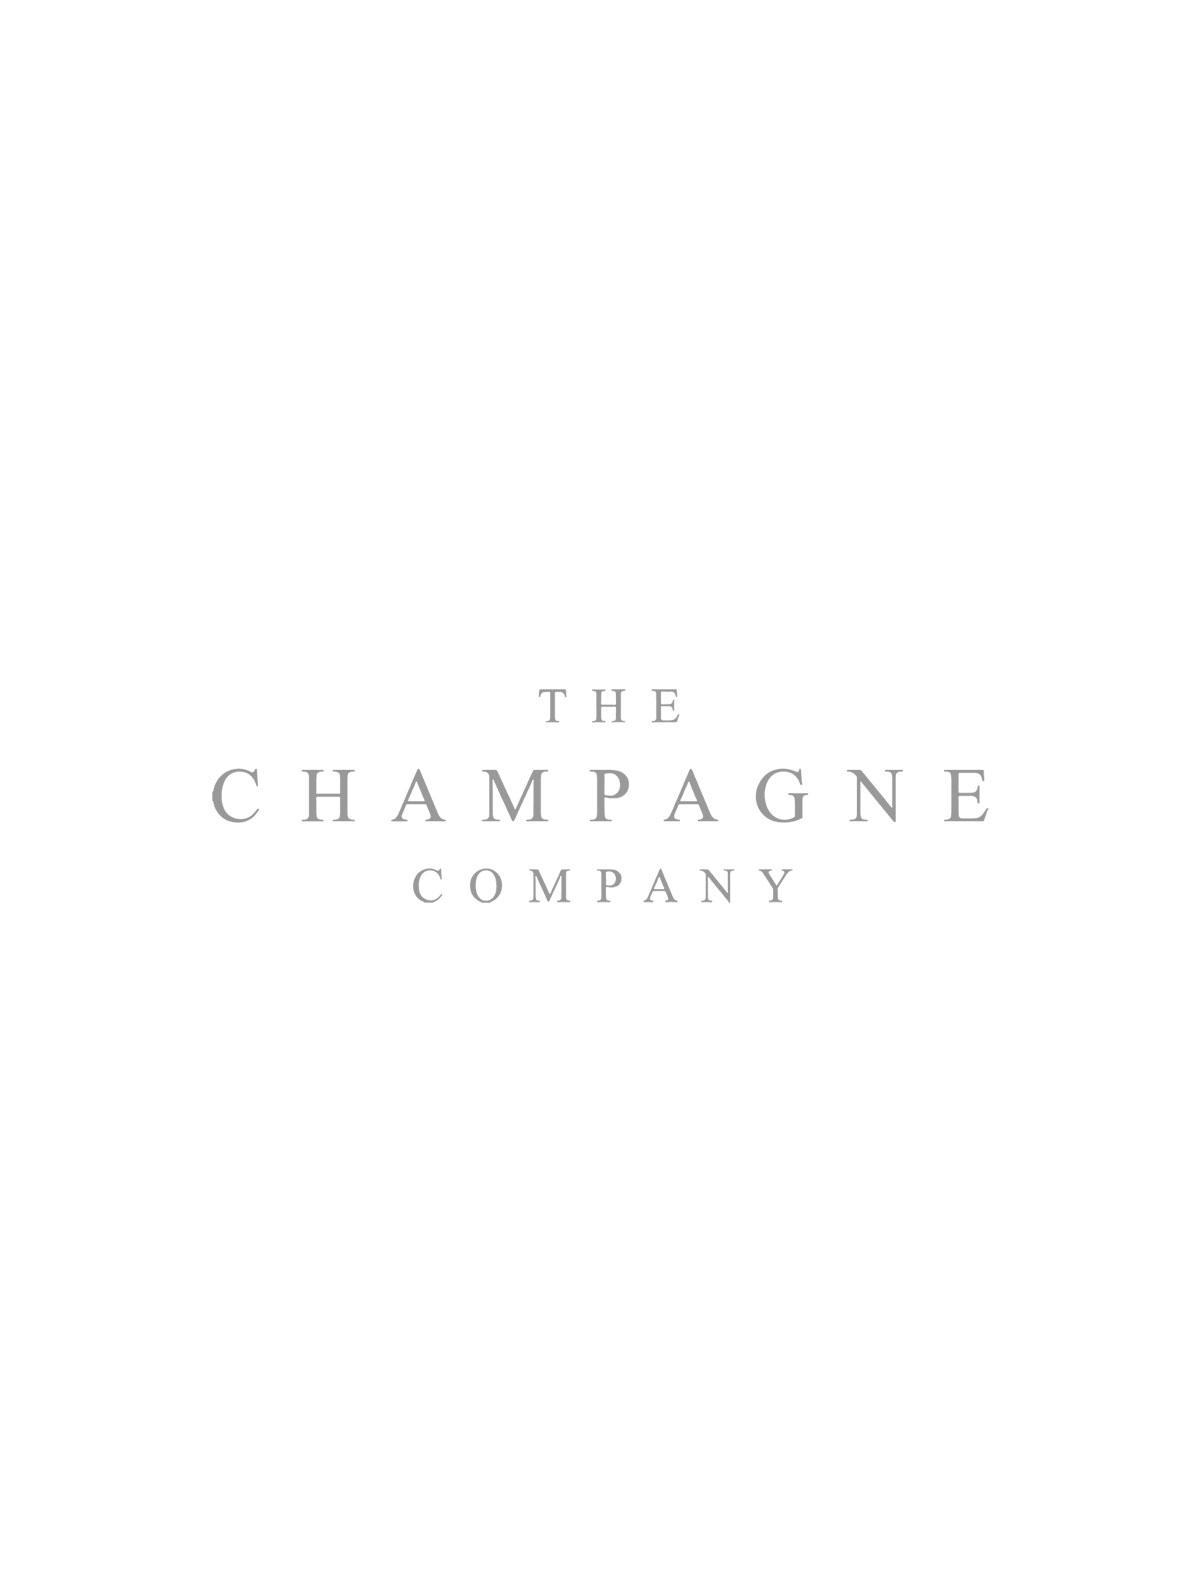 Fleur du Cap Unfiltered Merlot 2012 South Africa Red Wine